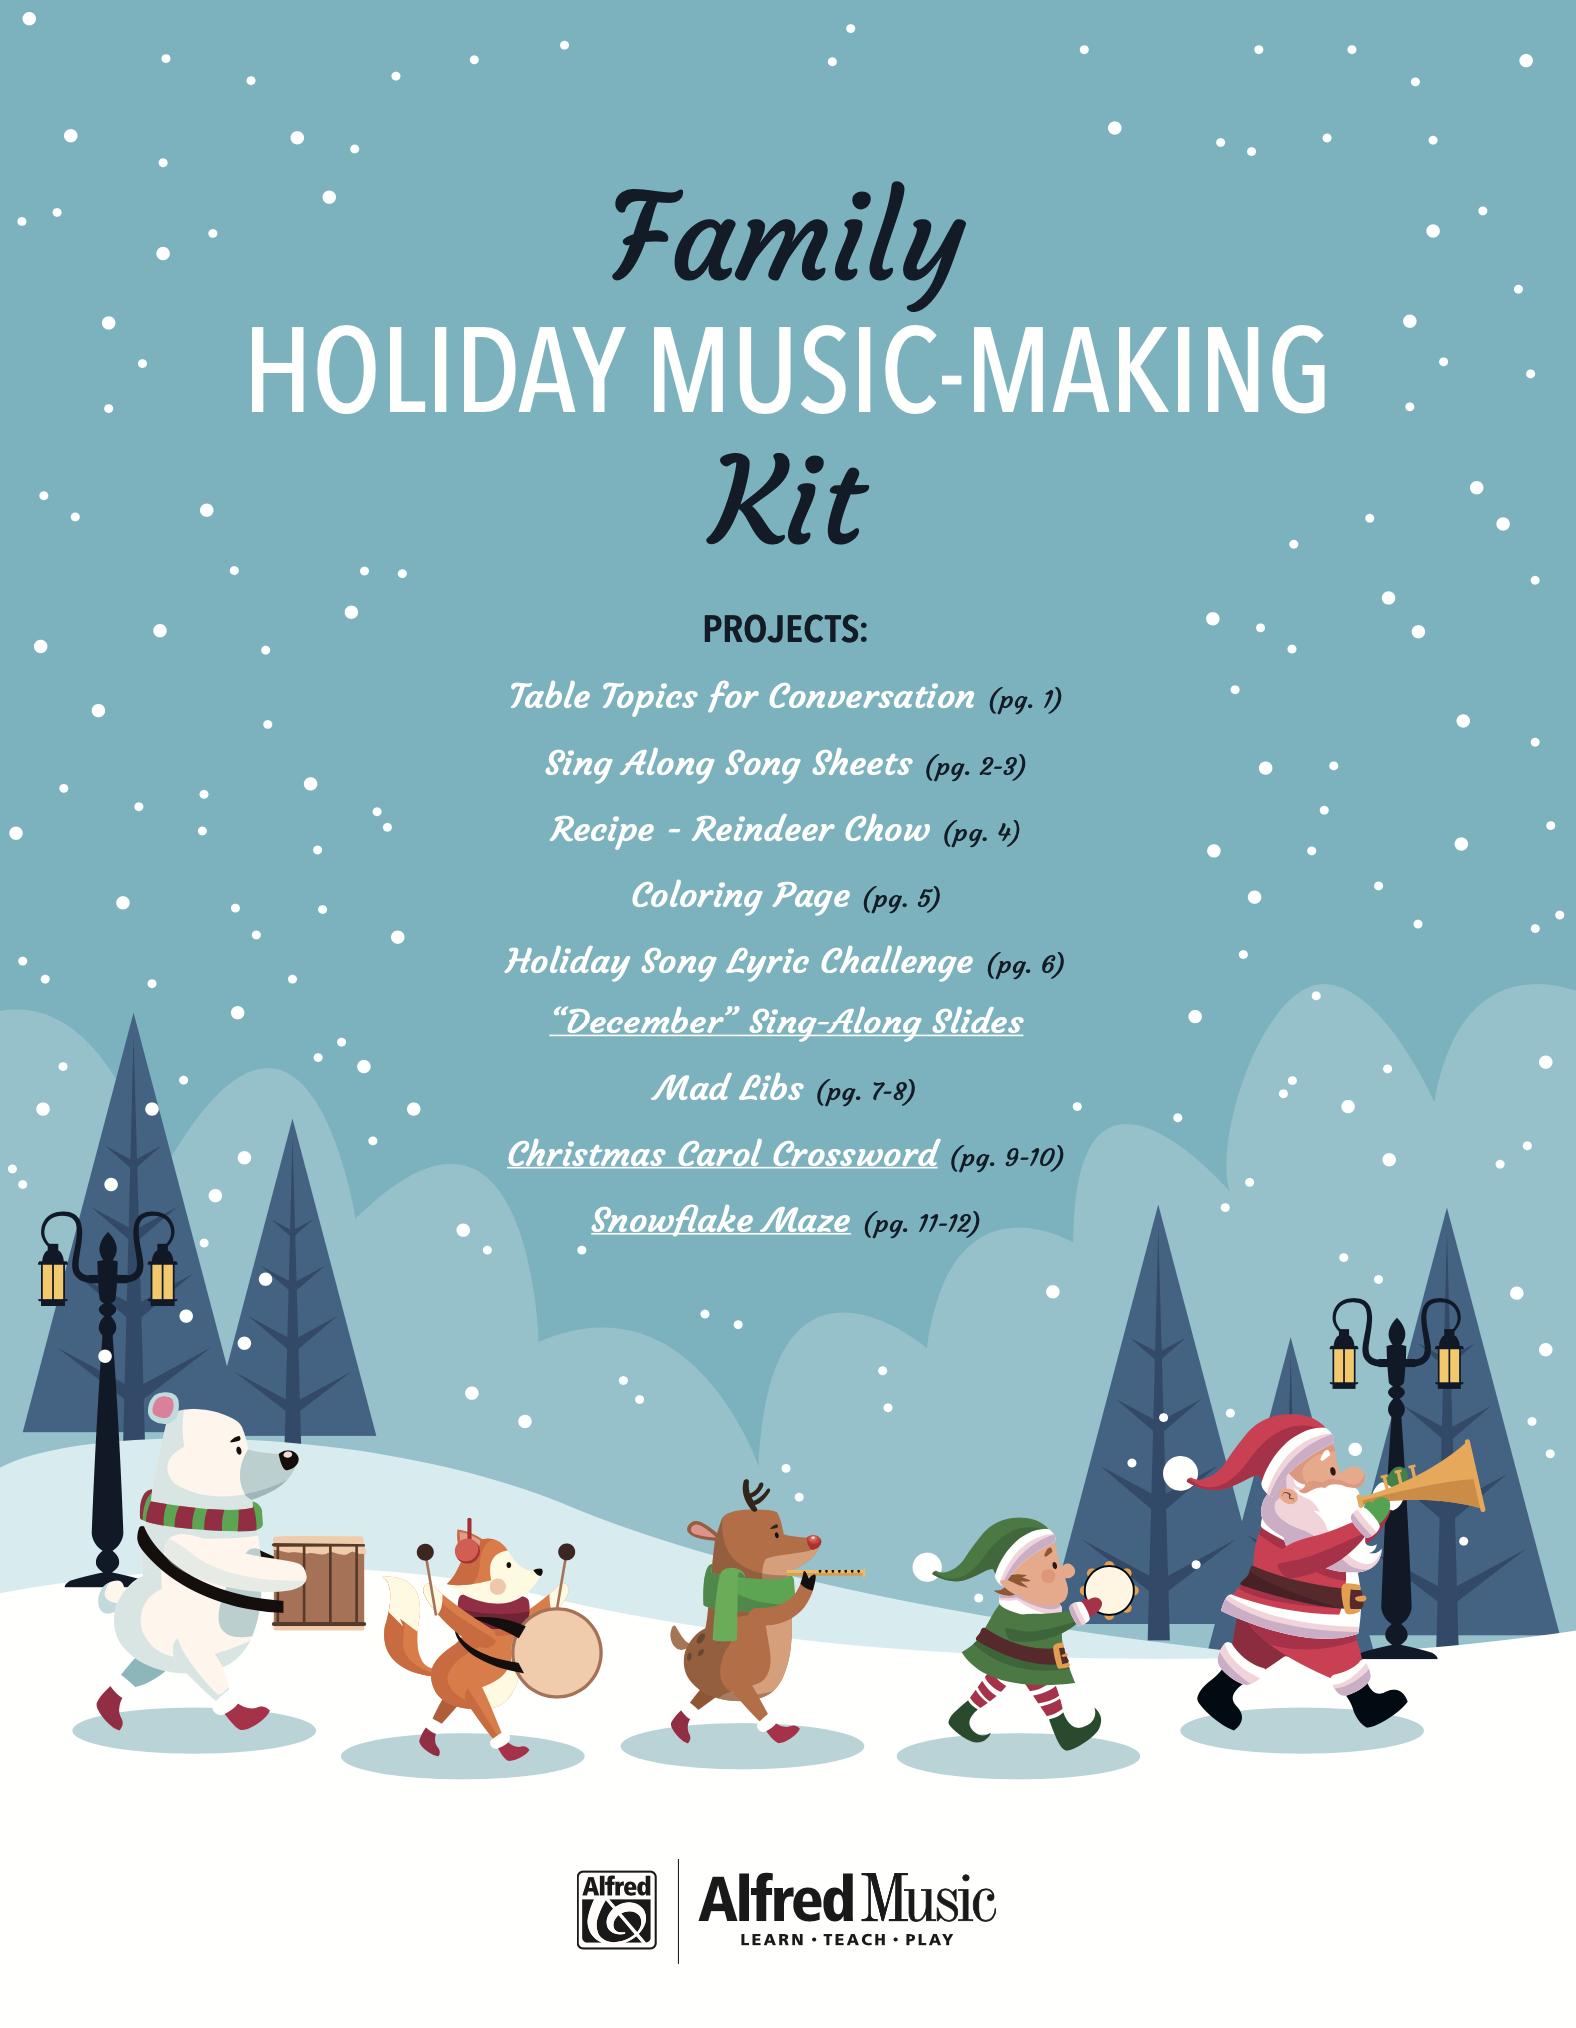 Family Holiday Music Kit Image